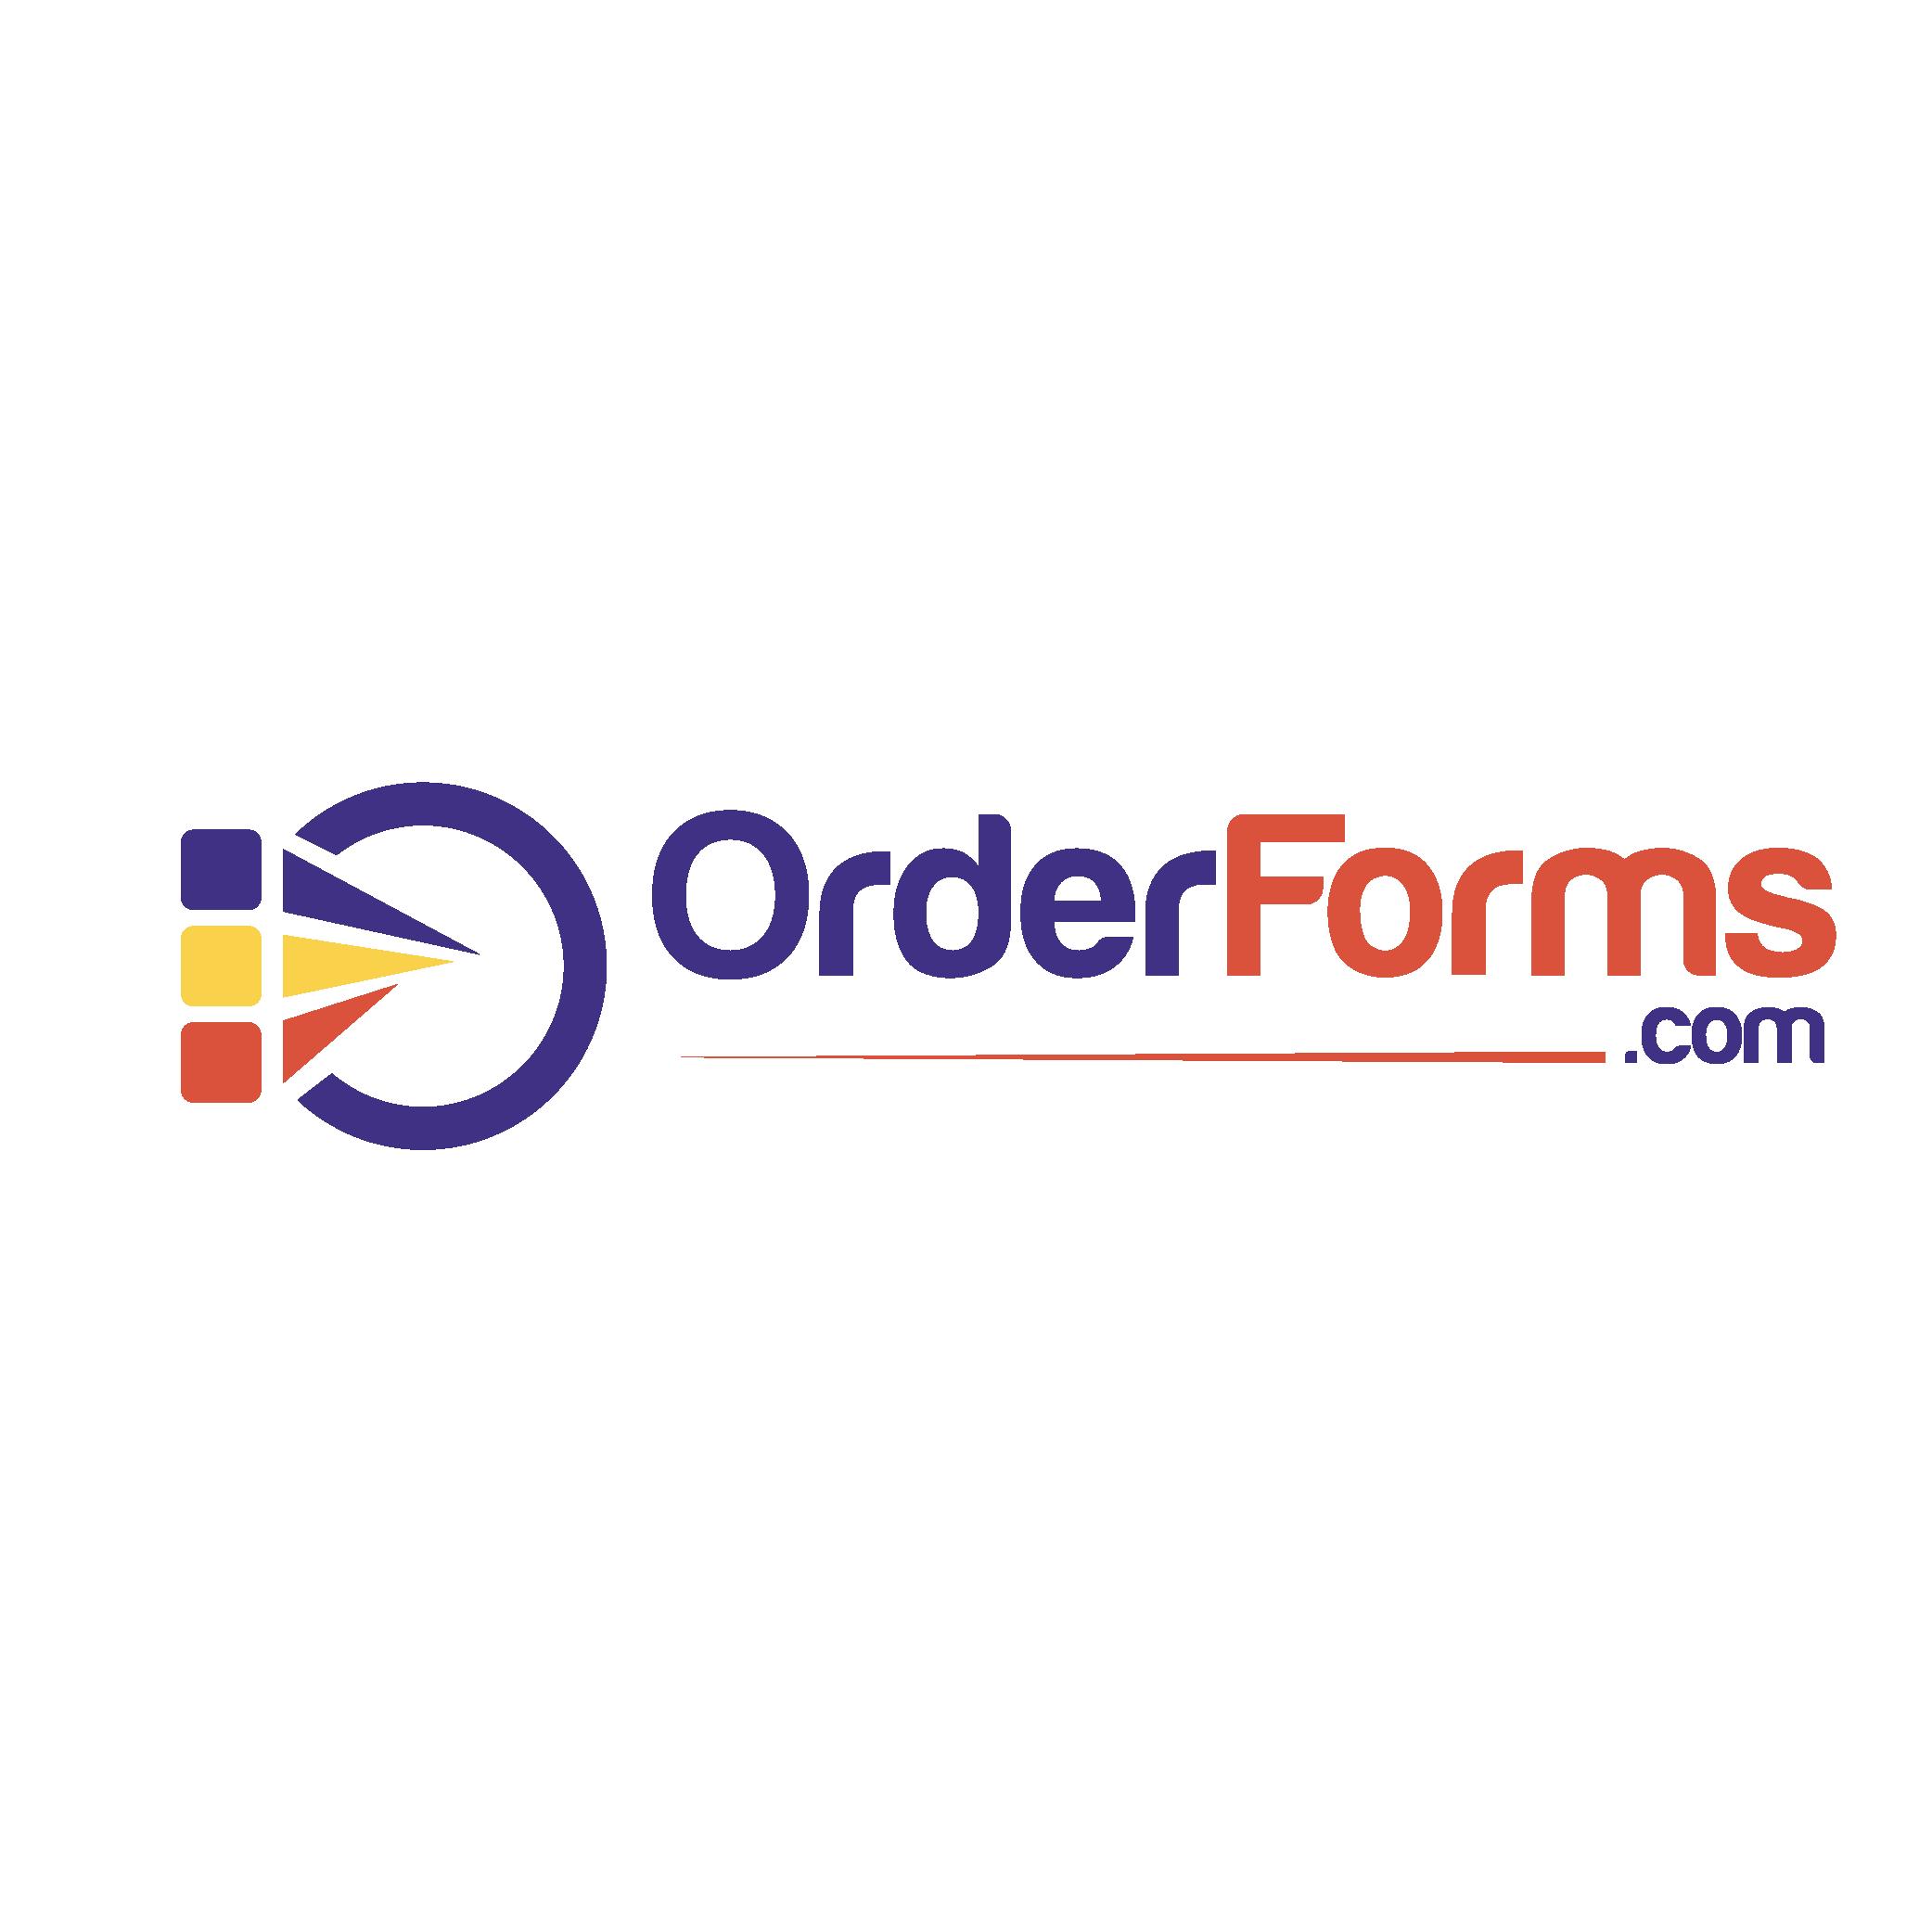 OrderForms.com